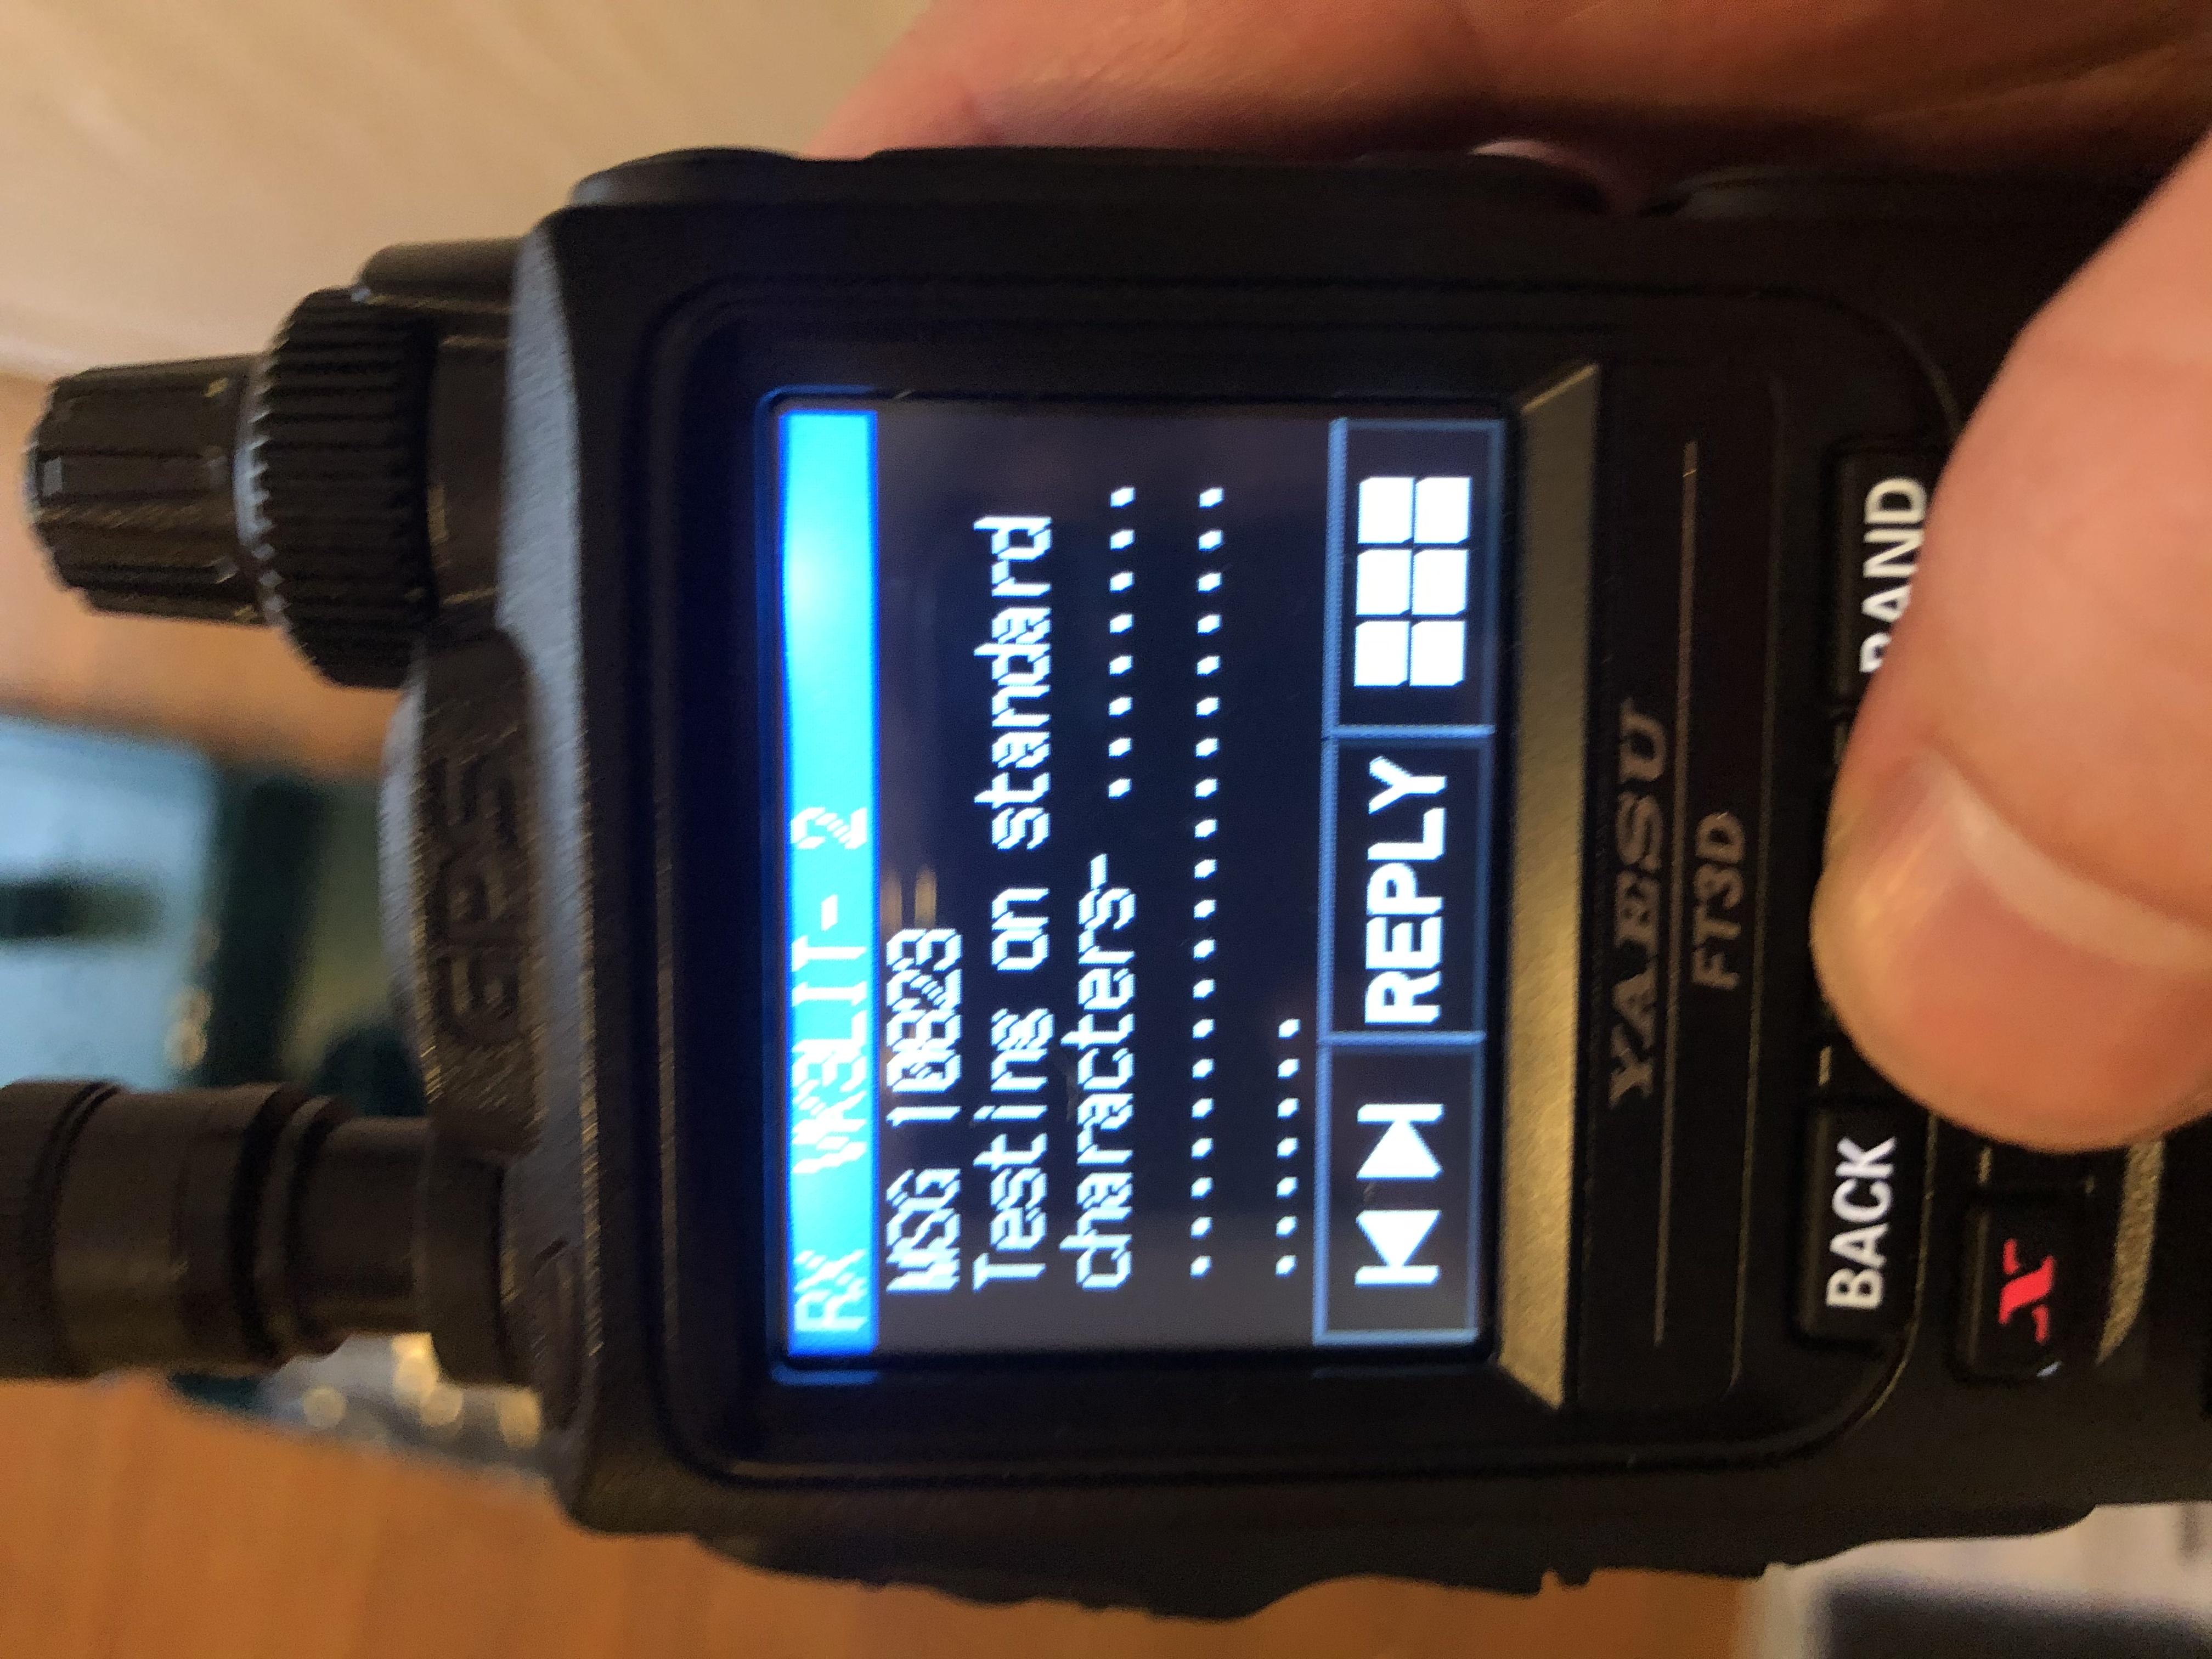 Close-up of Yaesu FT-3D receiving a message